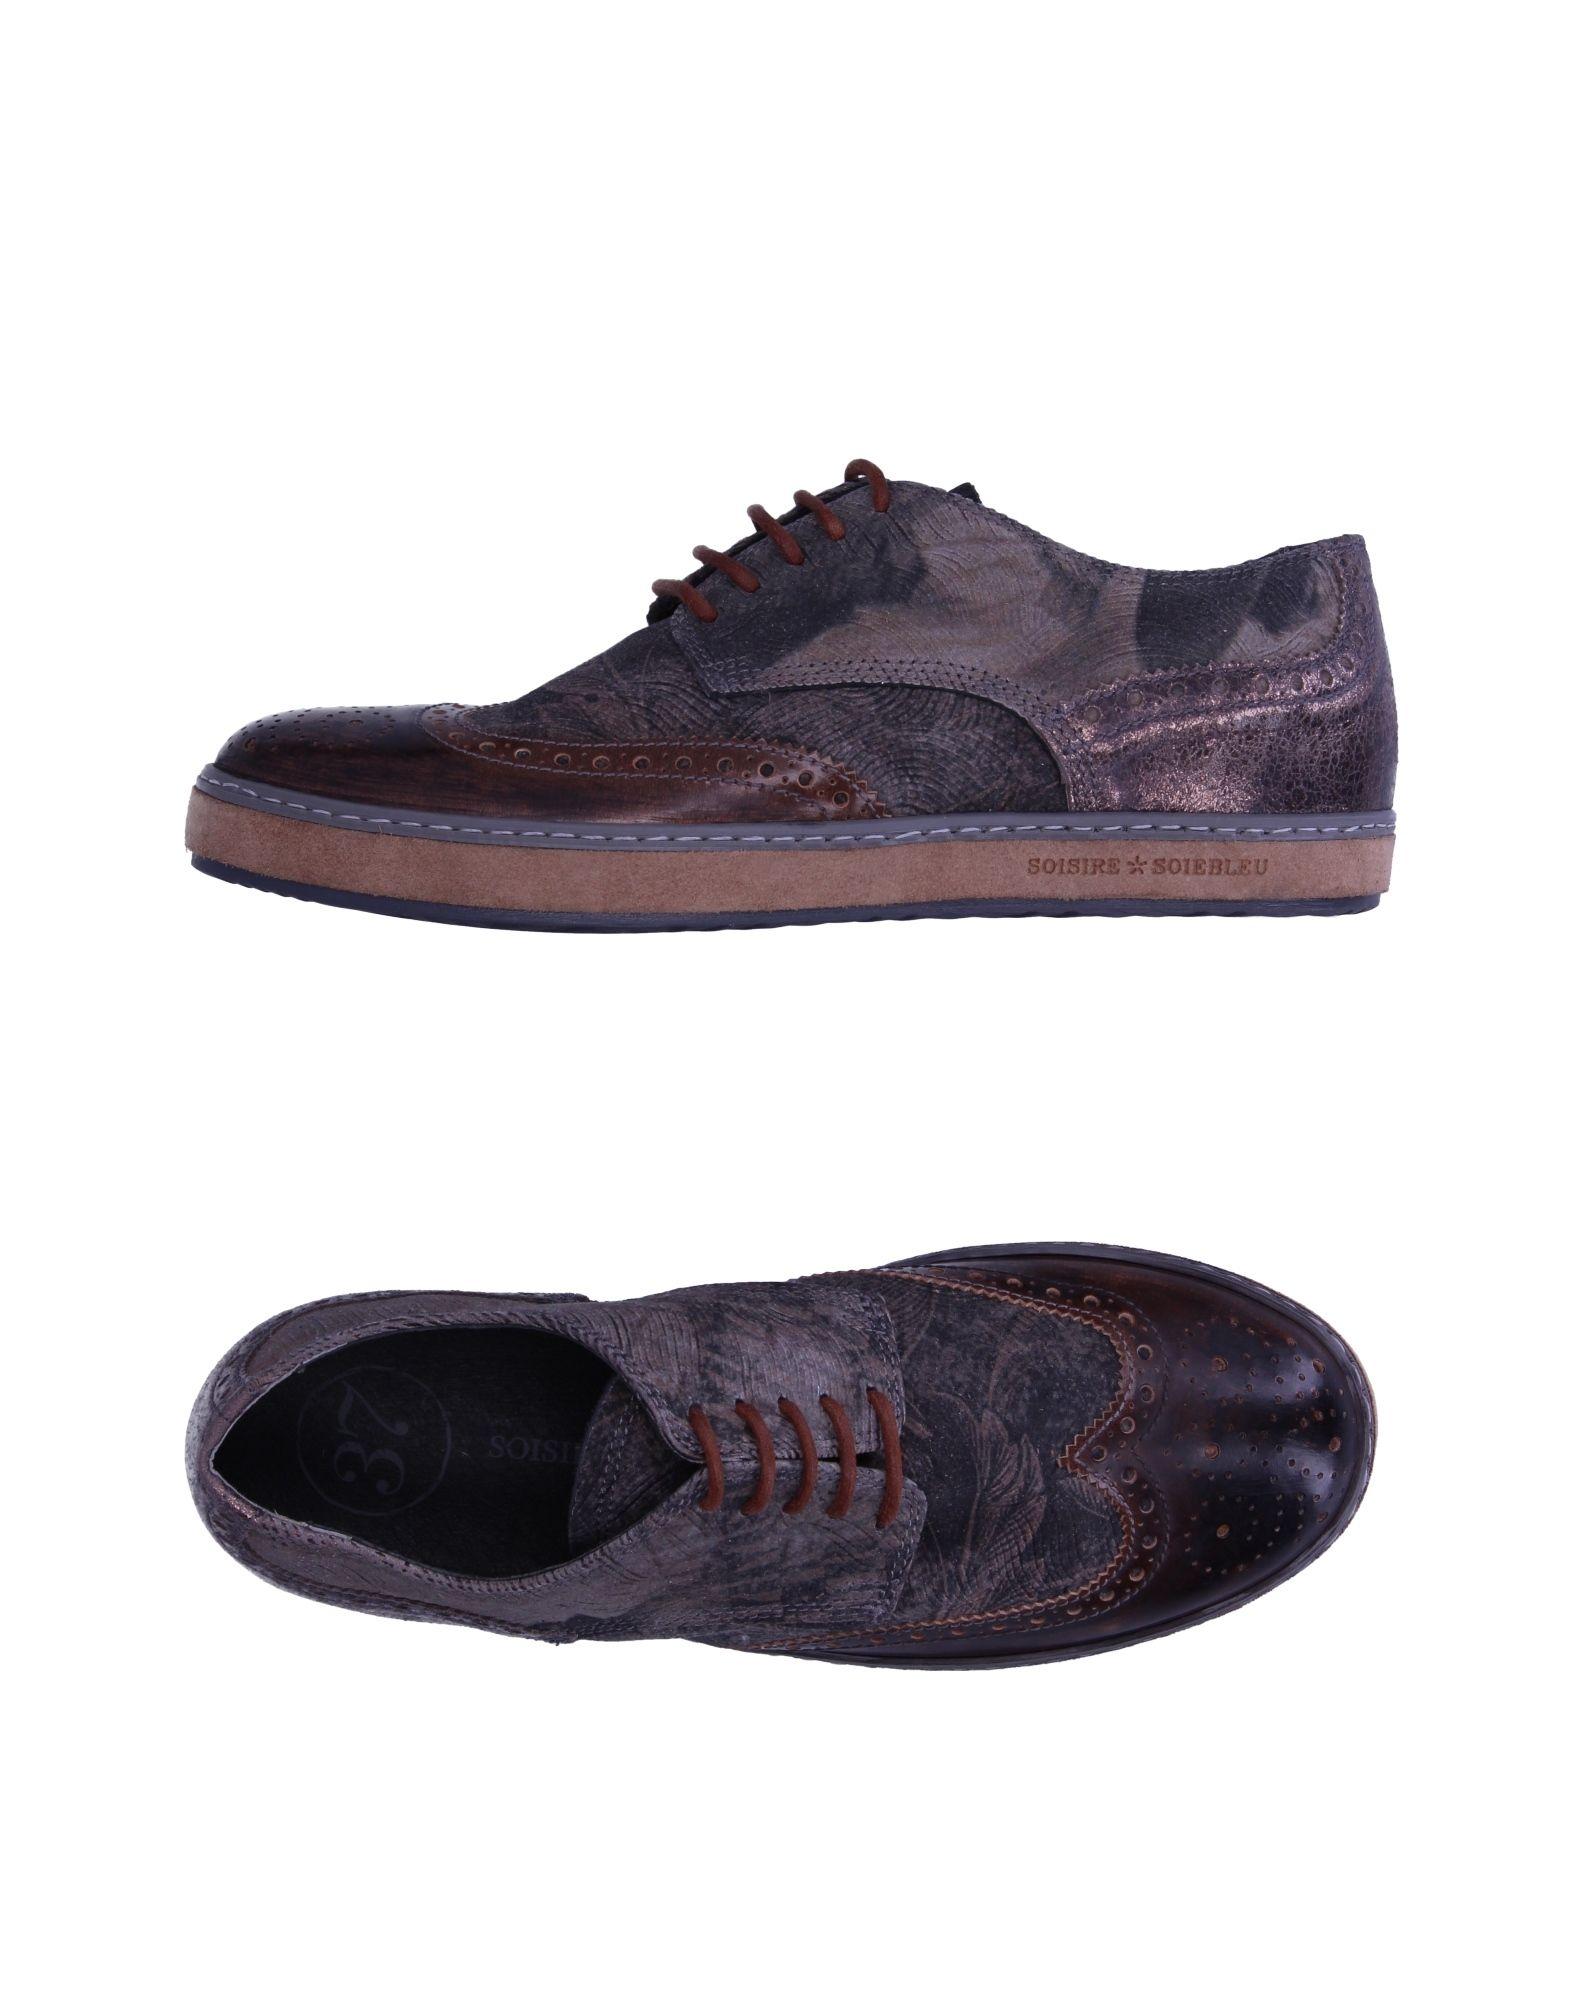 soisire soiebleu female soisire soiebleu laceup shoes